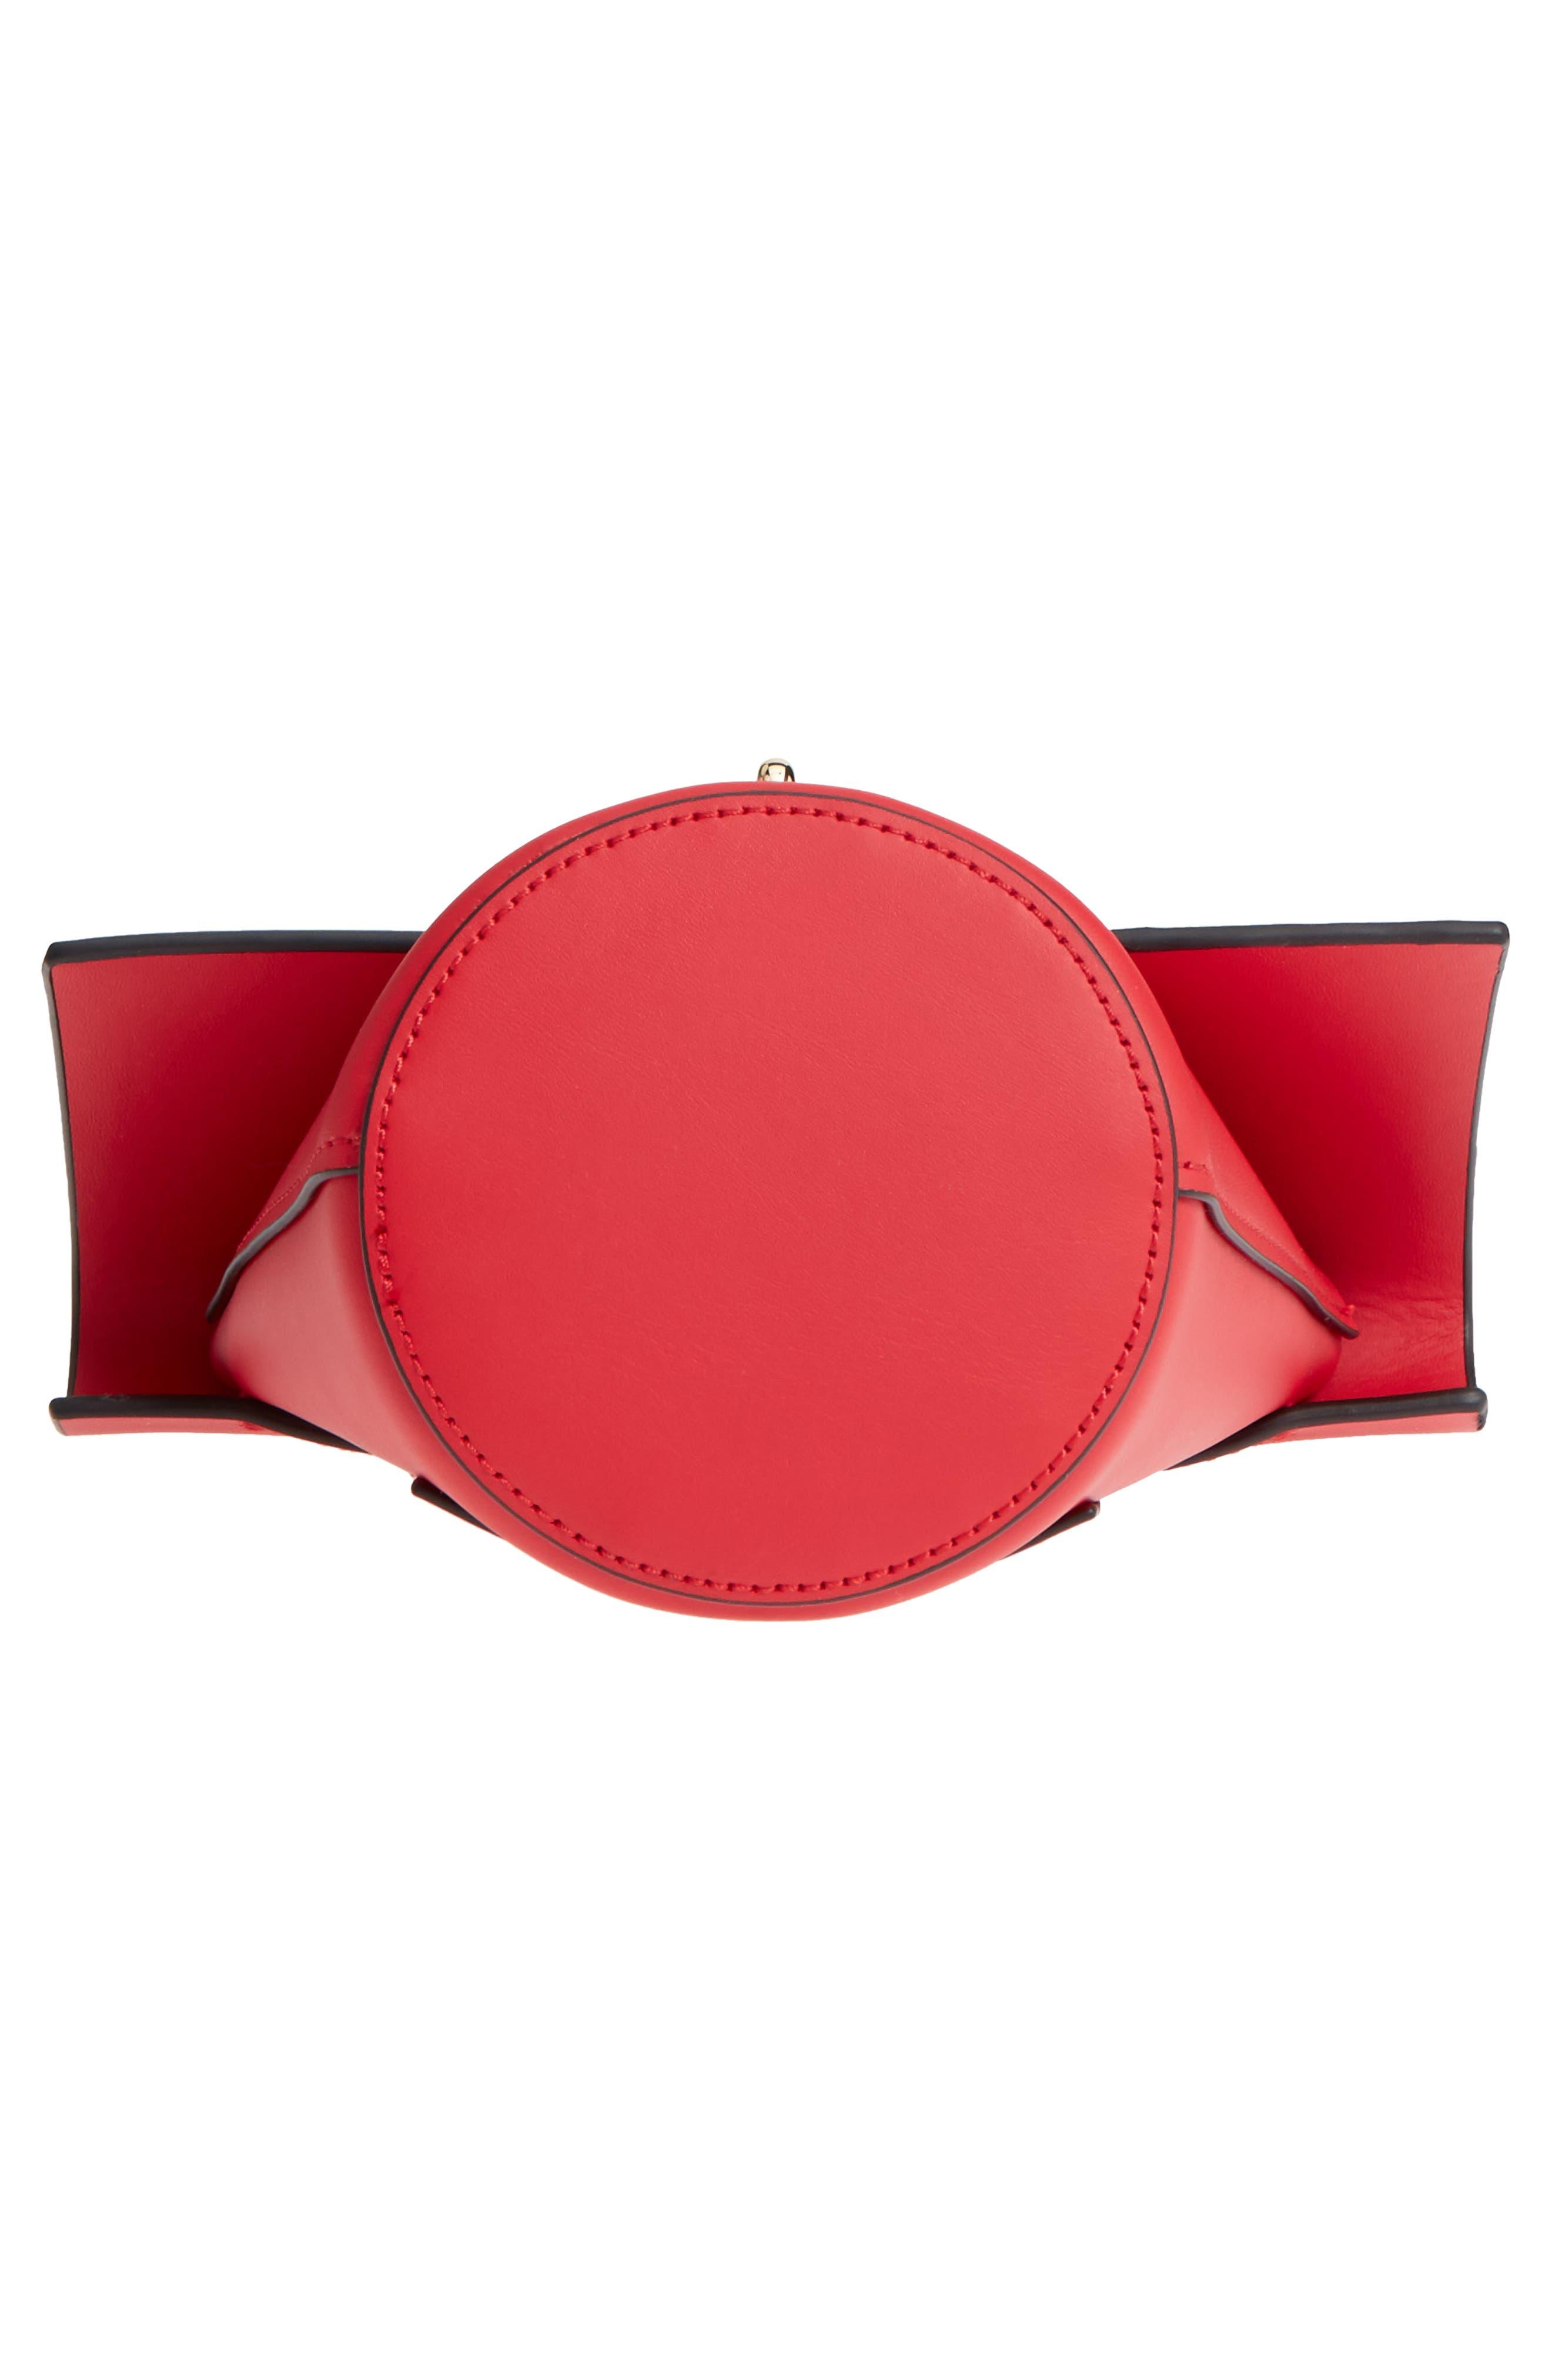 Belay Chain Calfskin Leather Crossbody Bag,                             Alternate thumbnail 20, color,